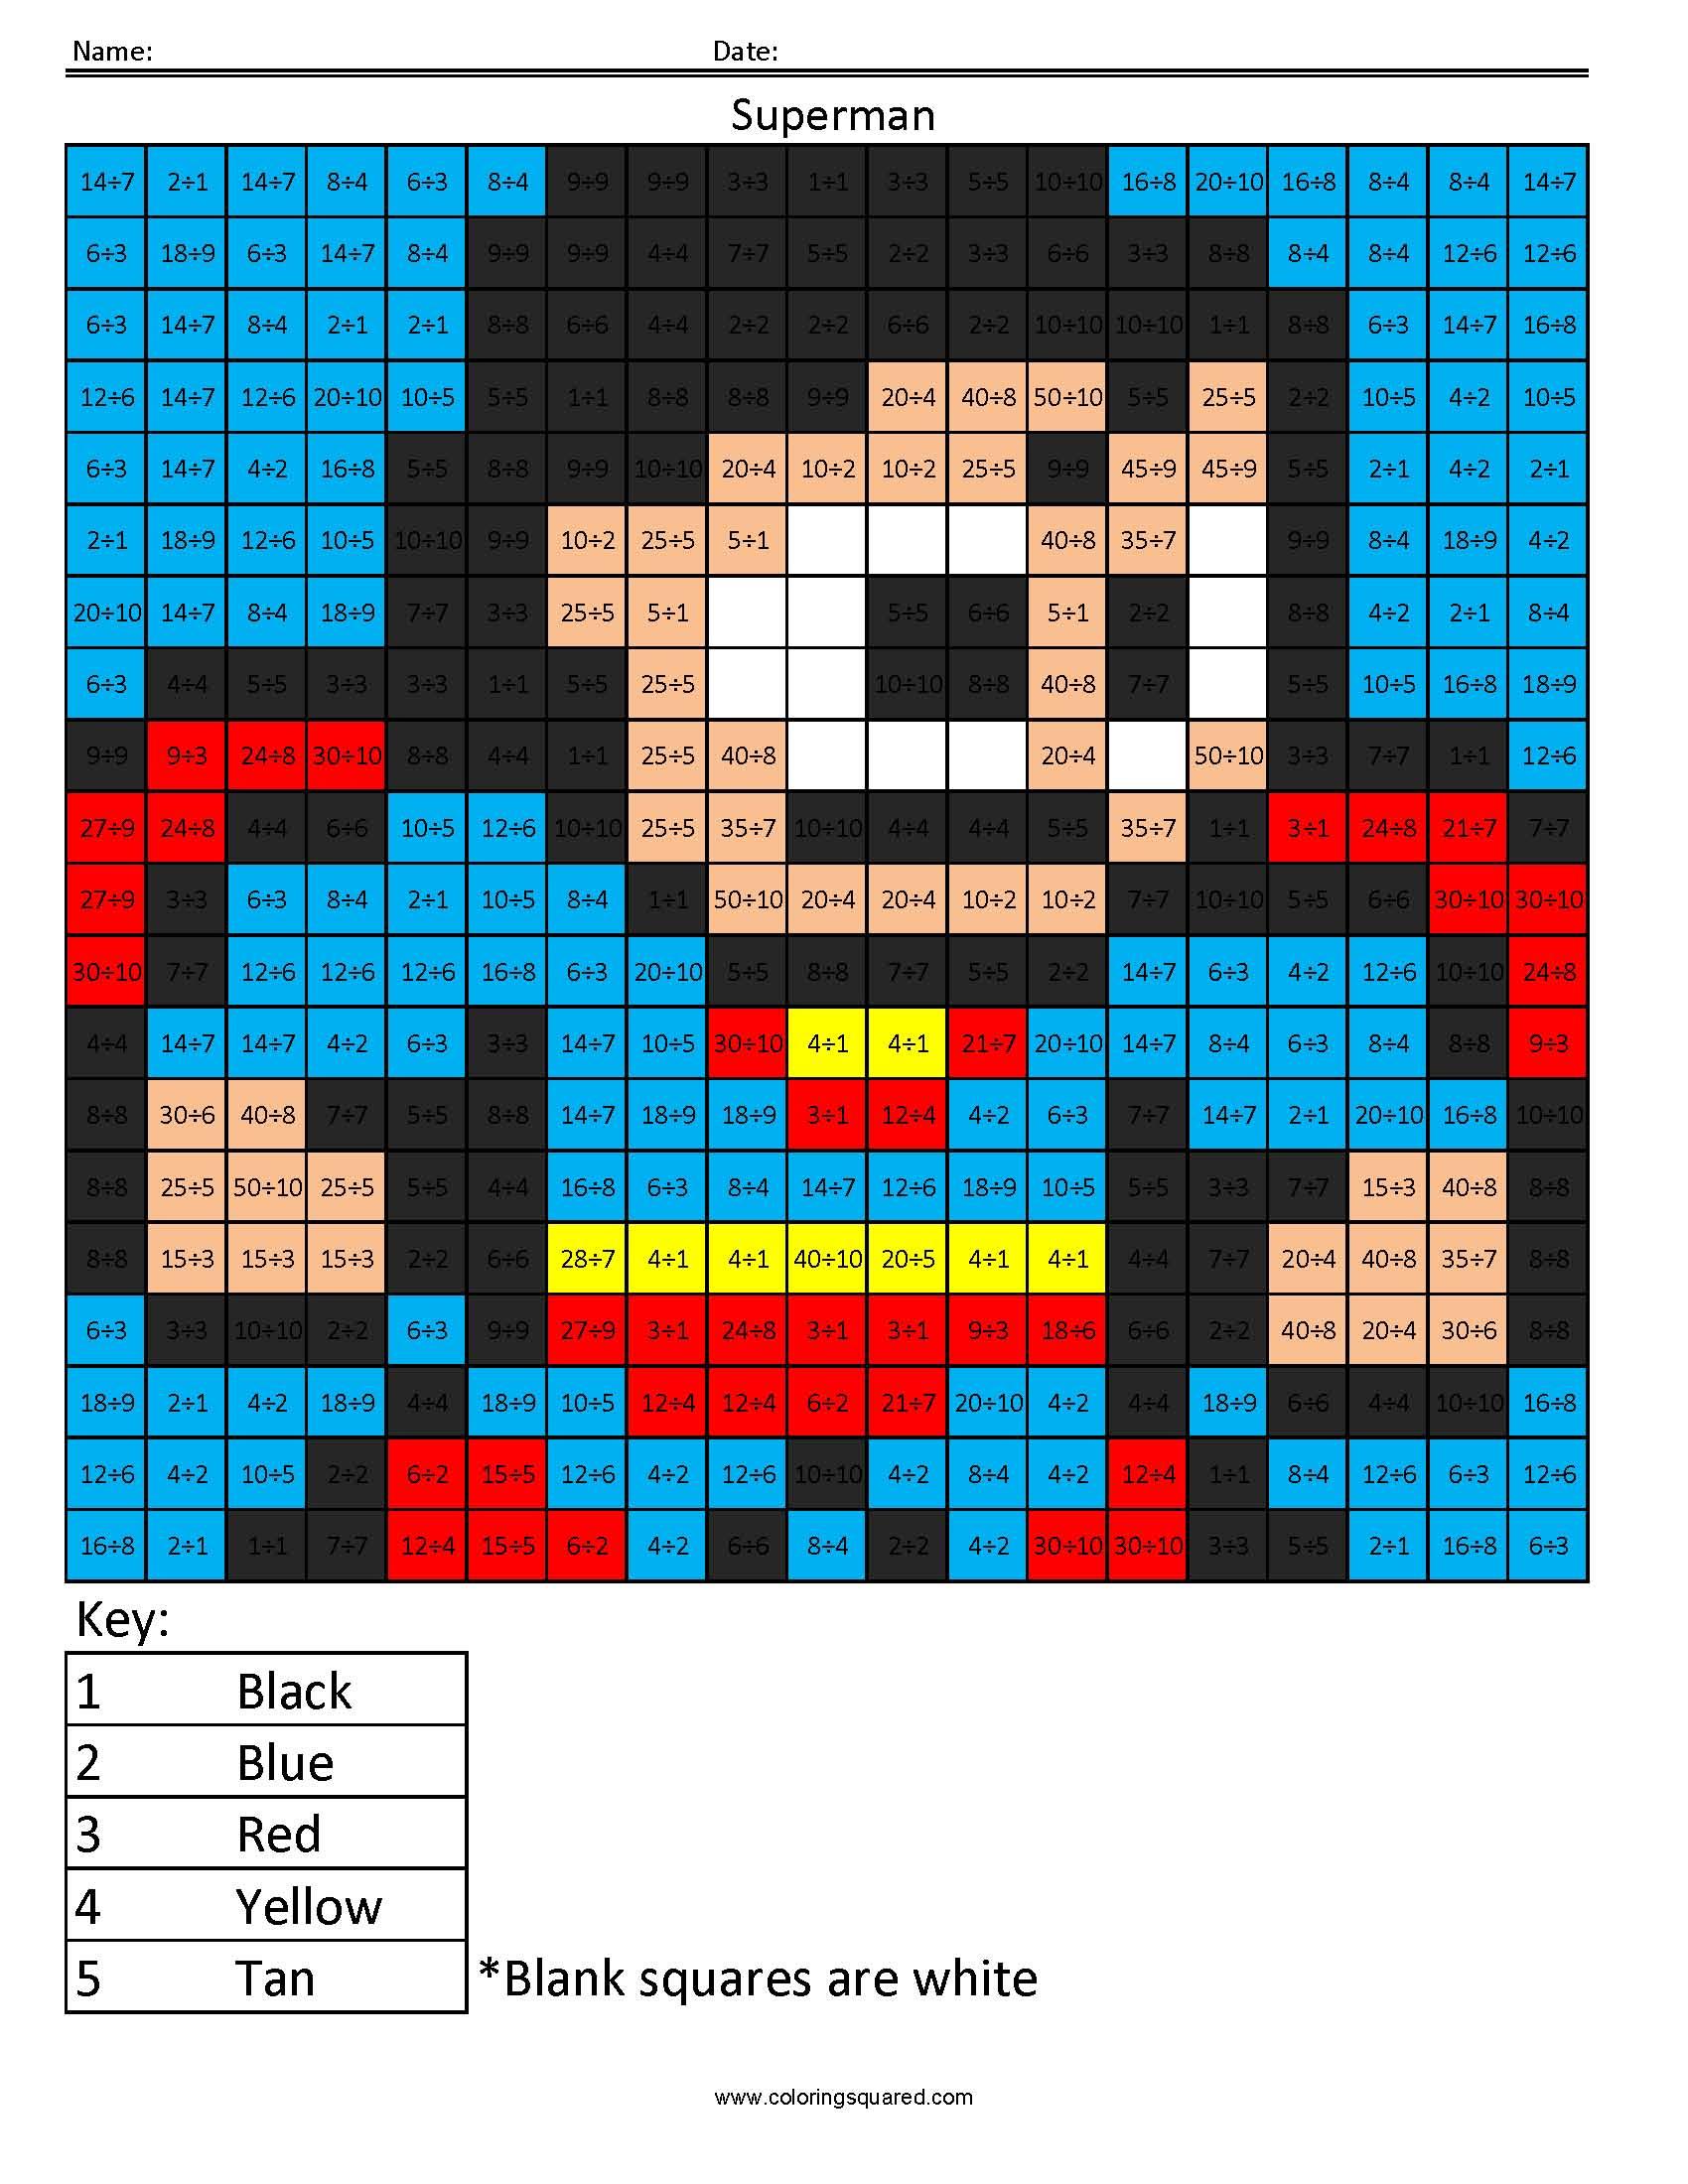 Superman Division